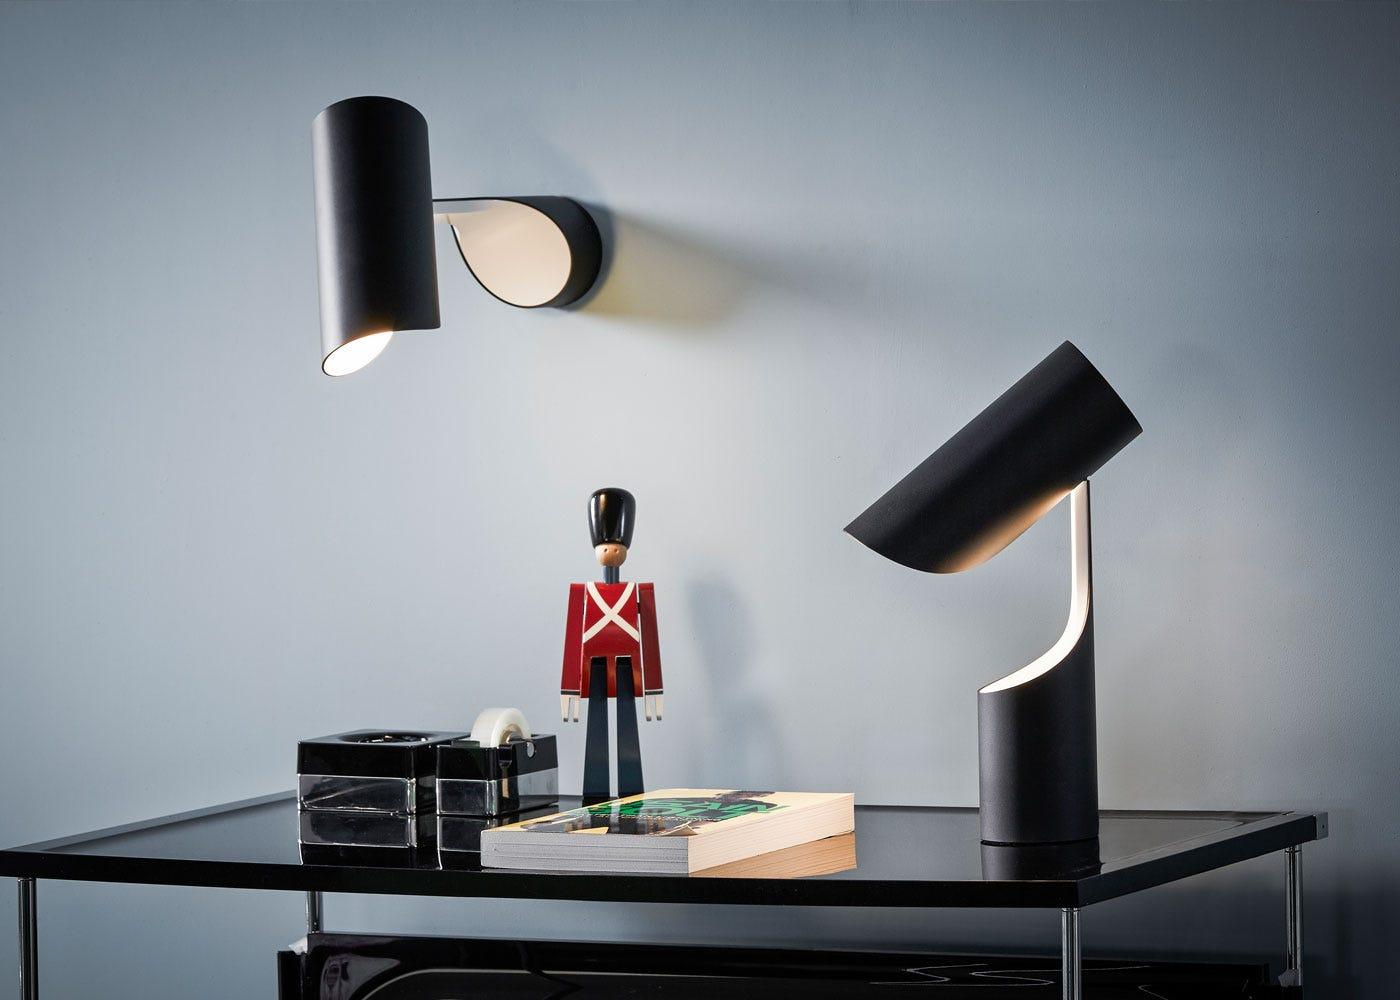 As shown: Mutatio Wall & table lamp in black.